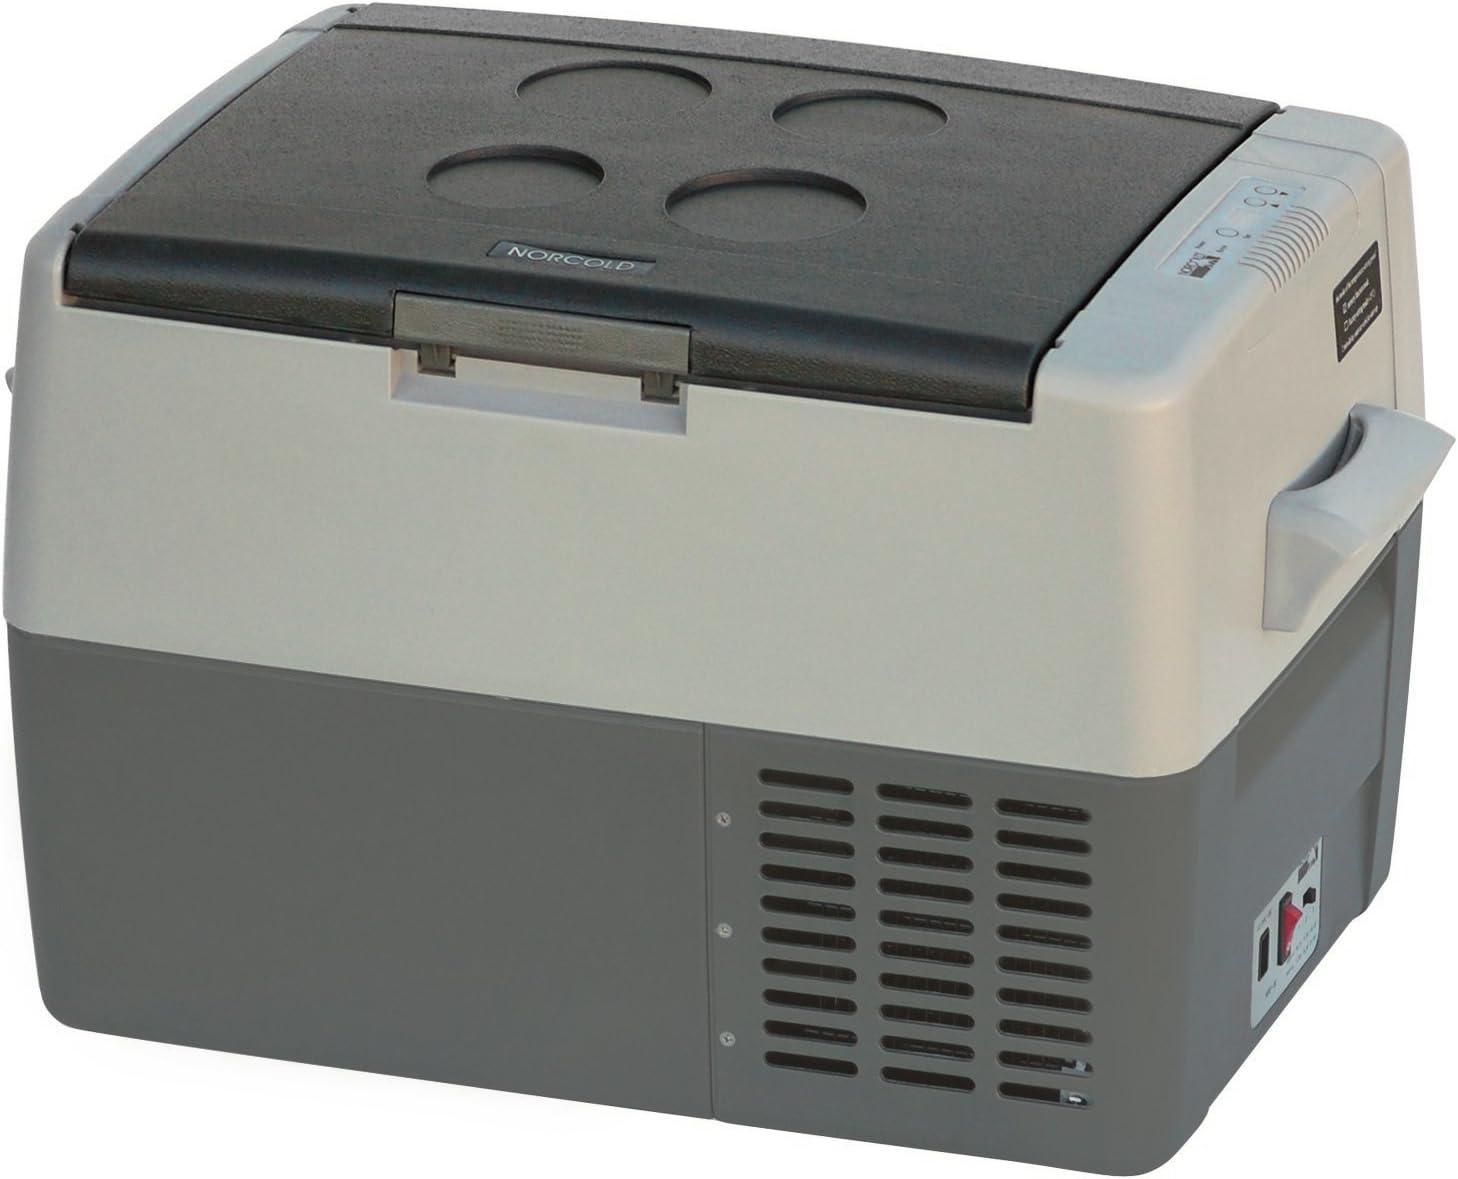 Norcold NRF30 Portable Refrigerator